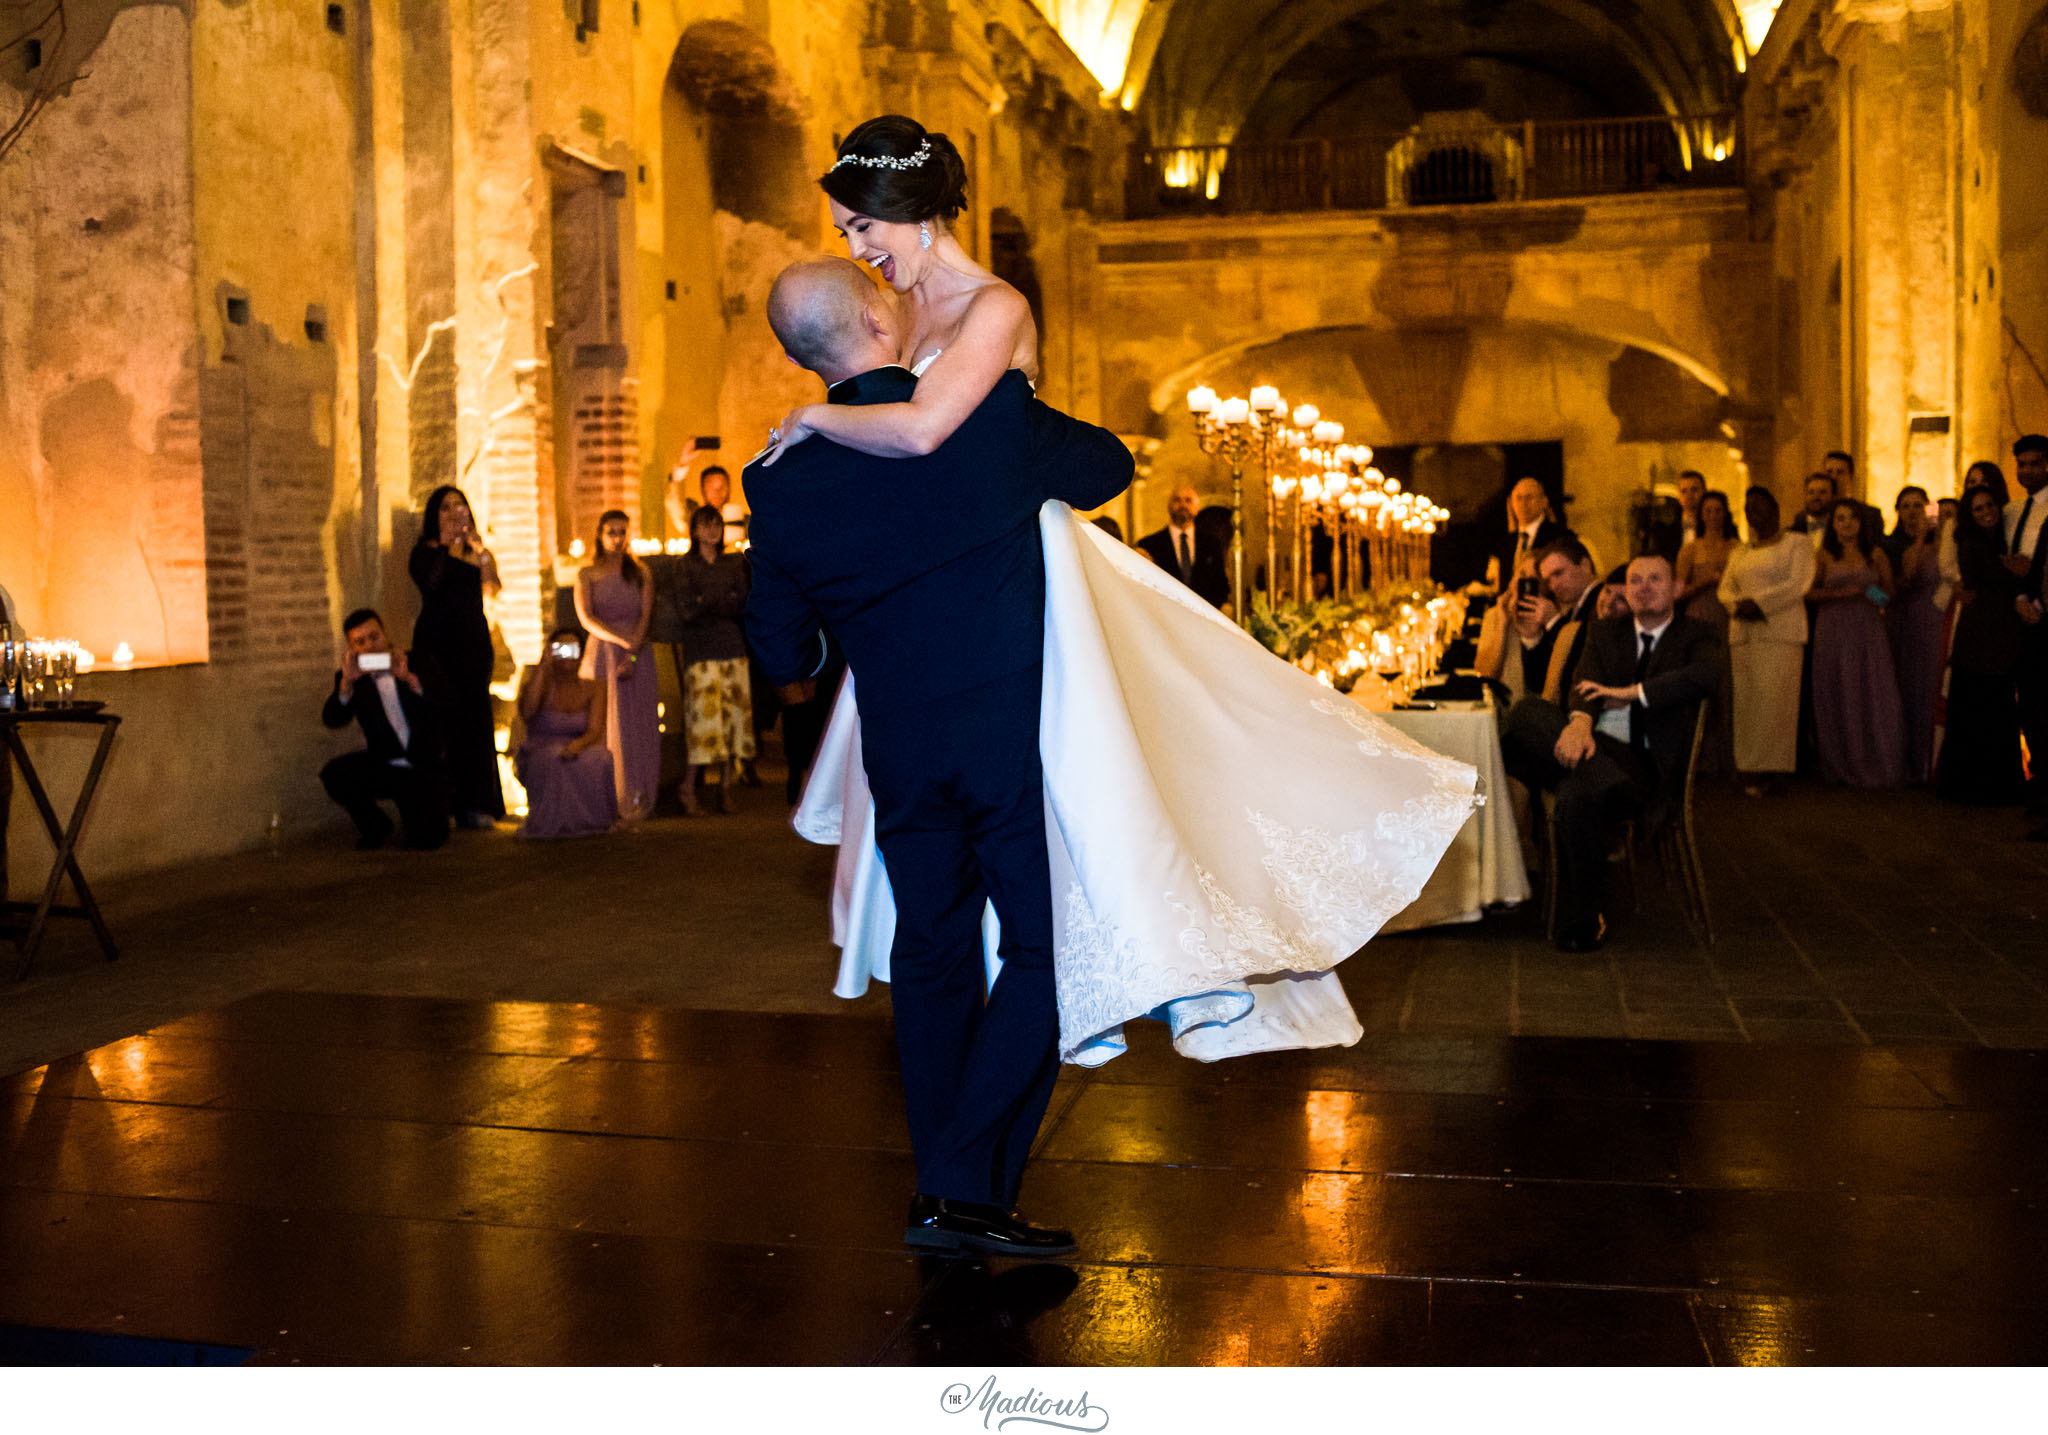 Leigh_Rob_Antigua_Guatemala_Santa_Clara_Destination_Wedding_52.JPG